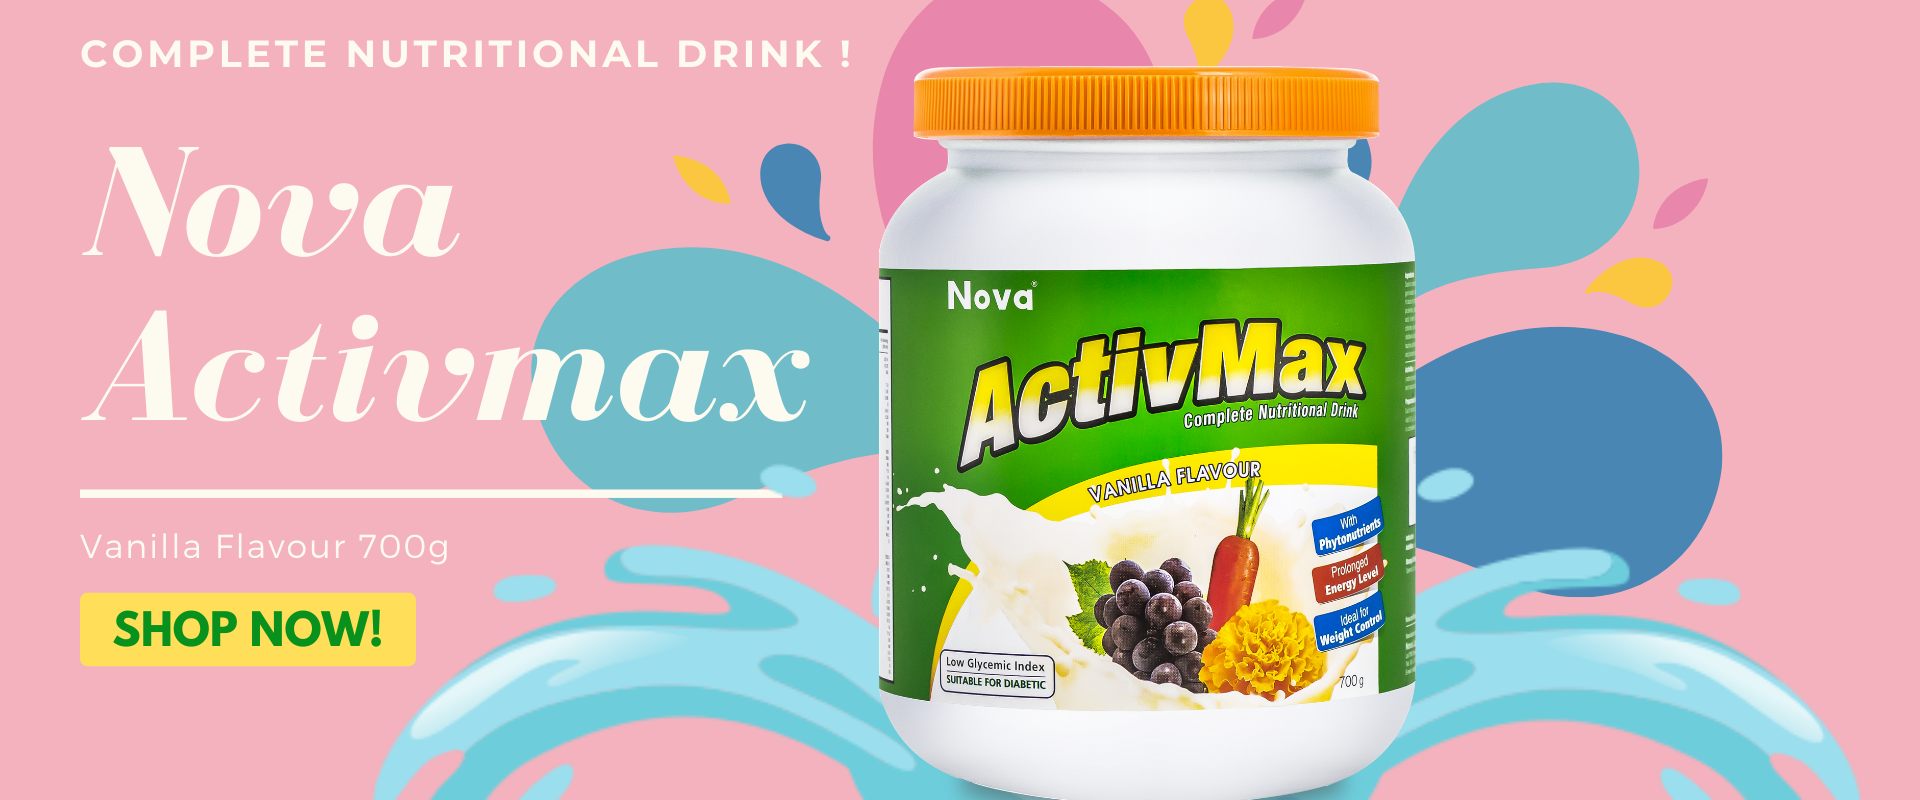 Nova Activmax Vanilla Flavour 700g